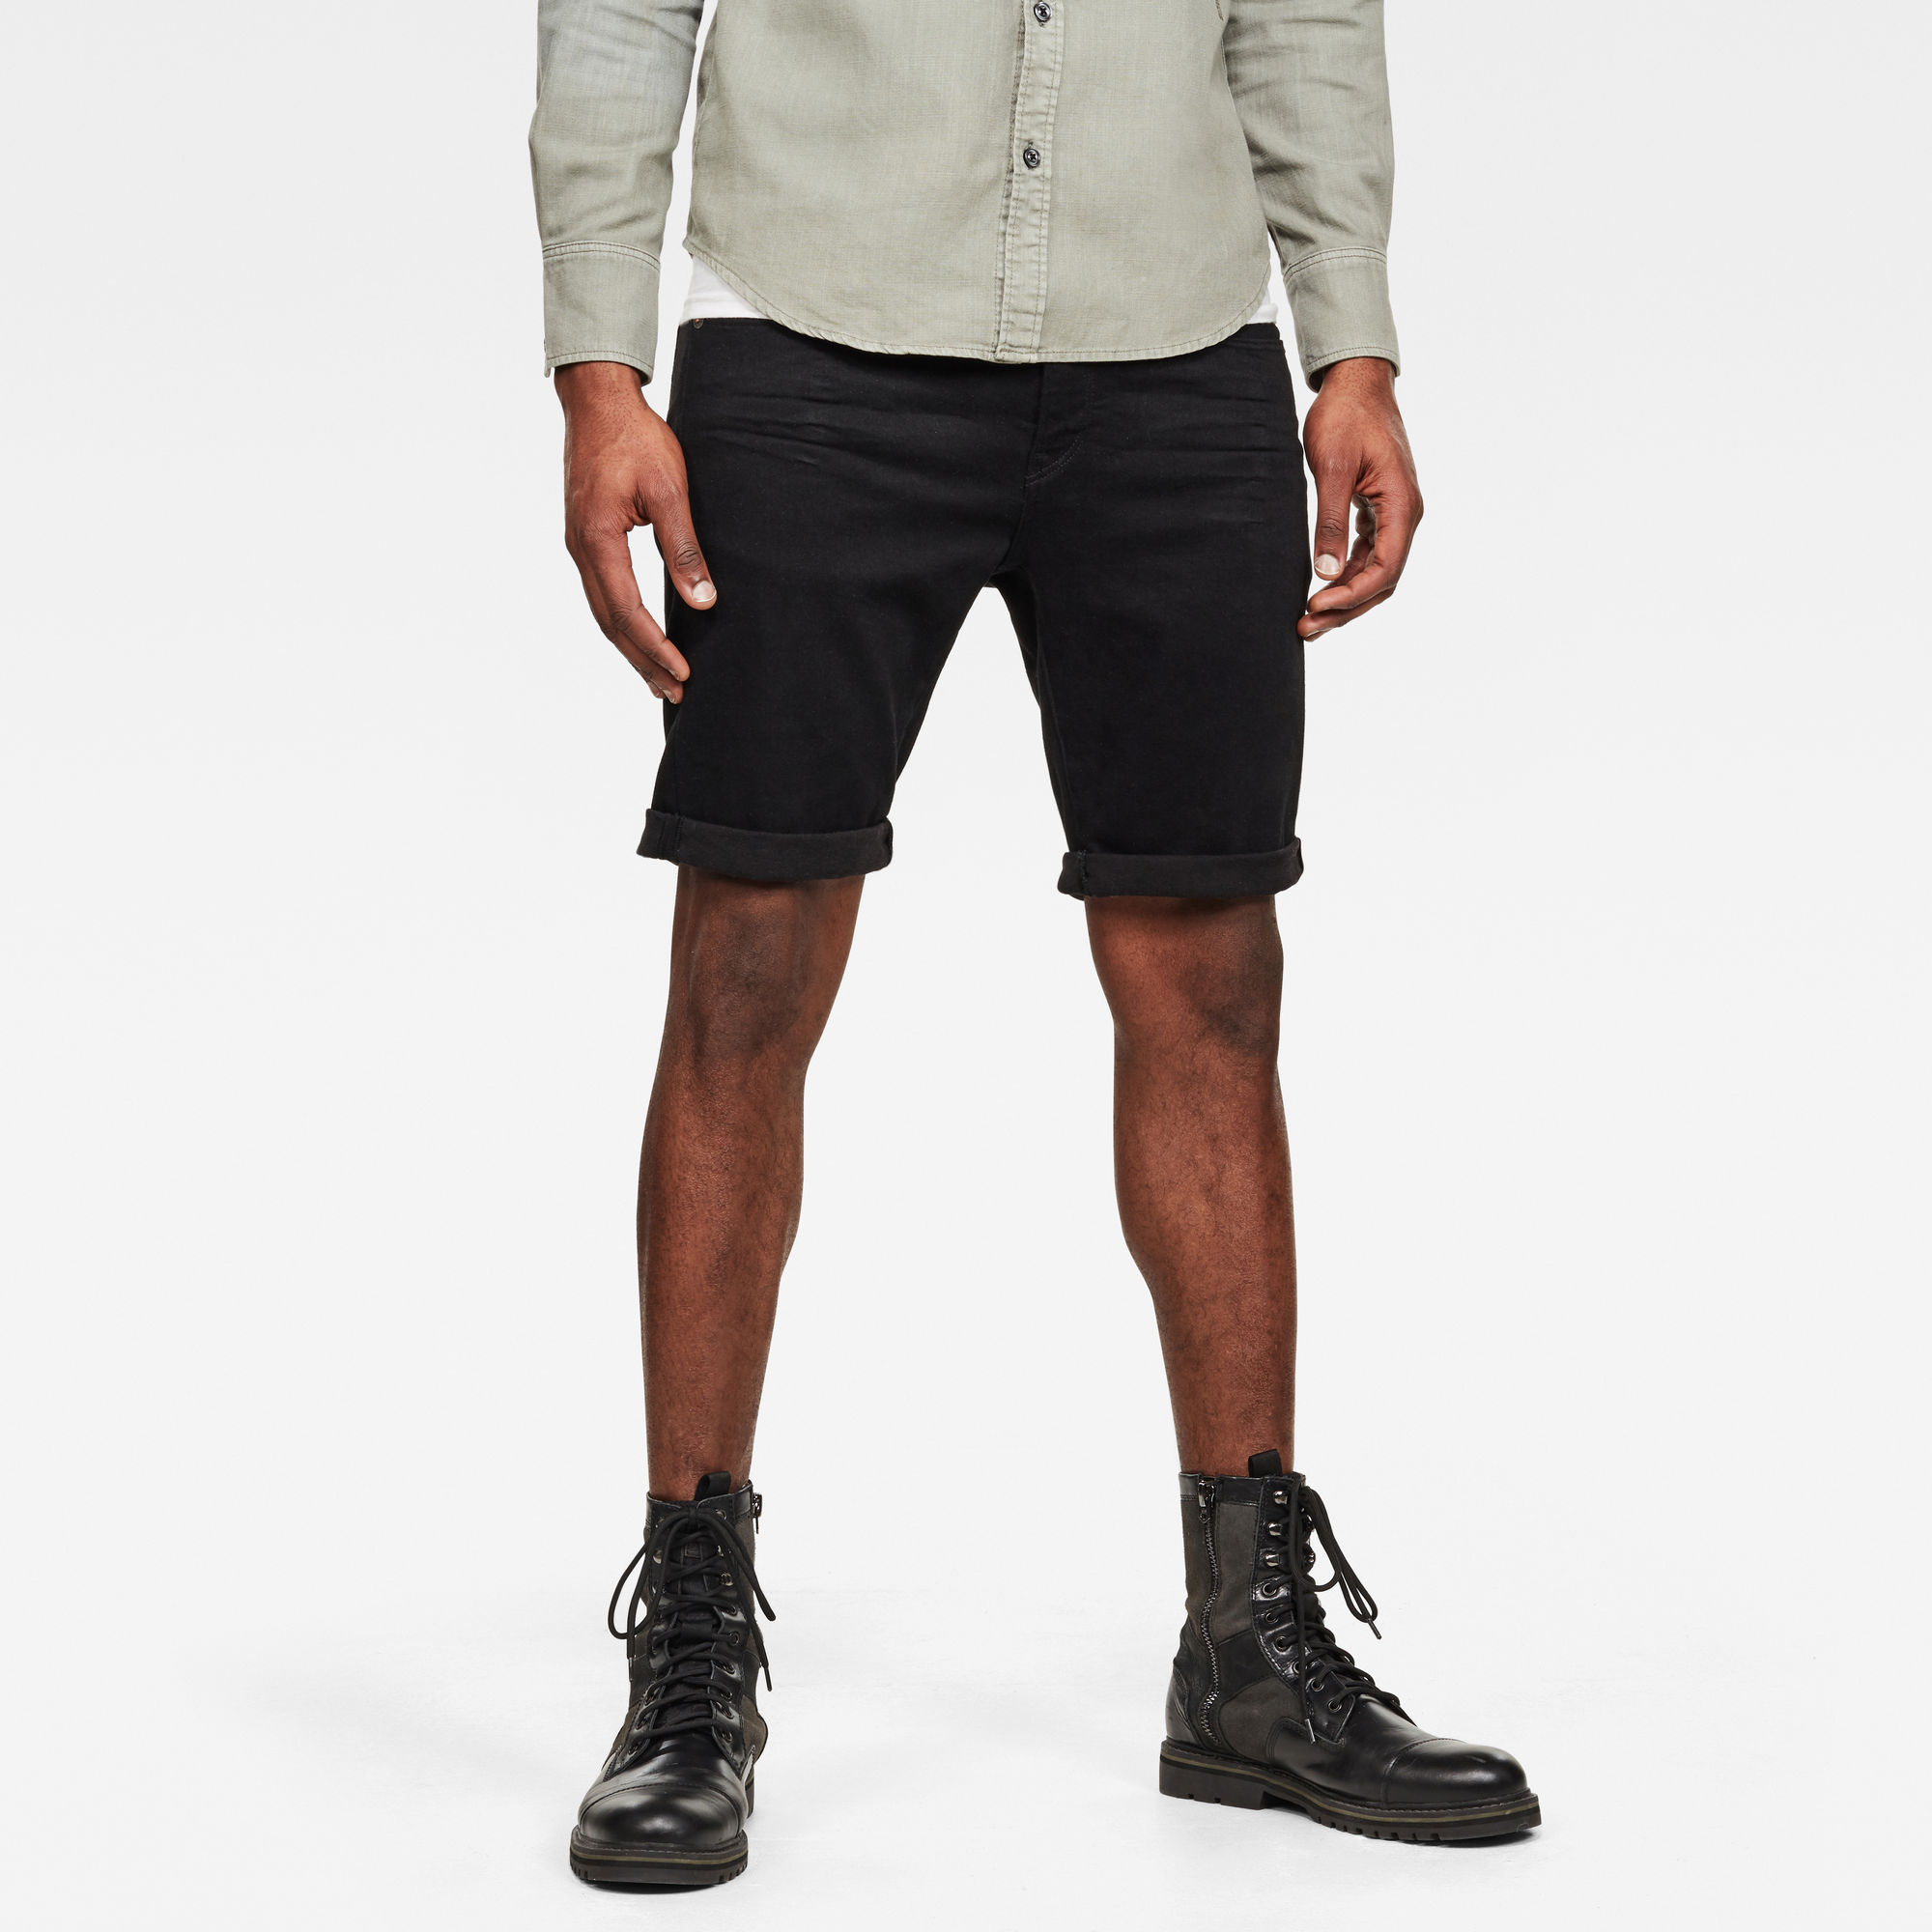 G-Star RAW Heren 3301 Slim Short Zwart